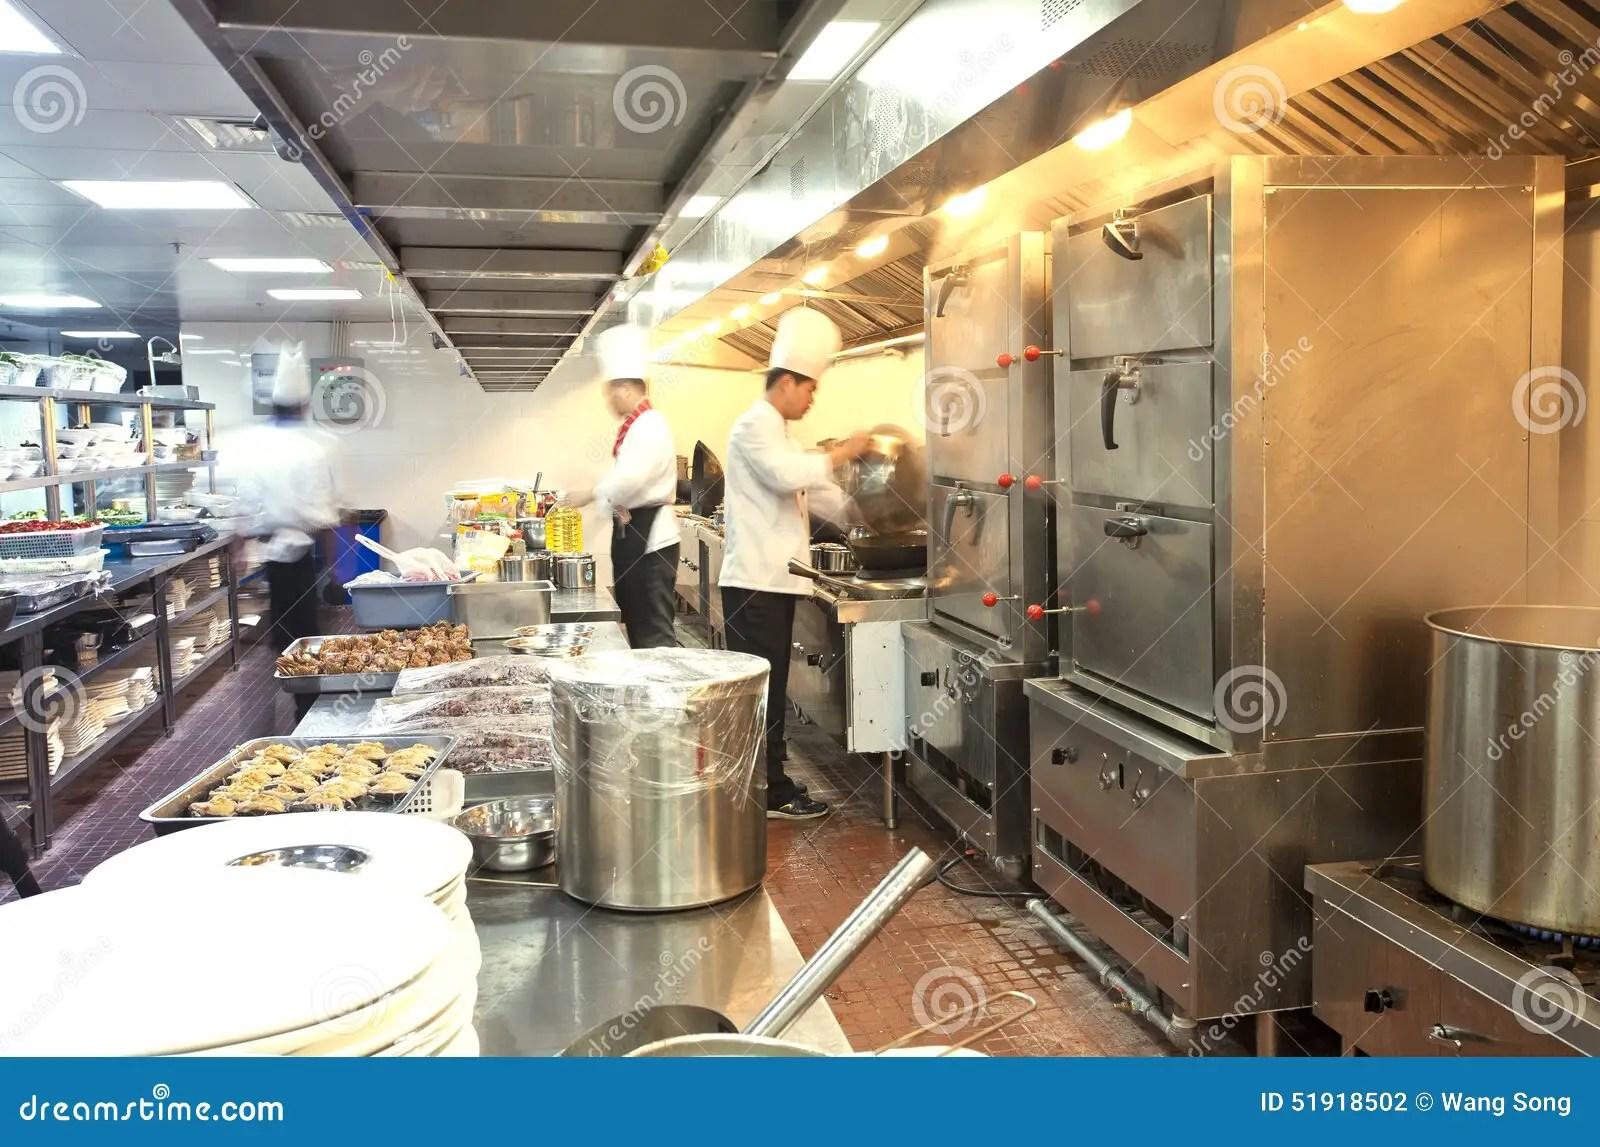 commercial kitchens kitchen cabinet molding 烹调在商业厨房的厨师图库摄影片 图片包括有工作 厨房 服务 无法认出 烹调在商业厨房 热门工作的厨师